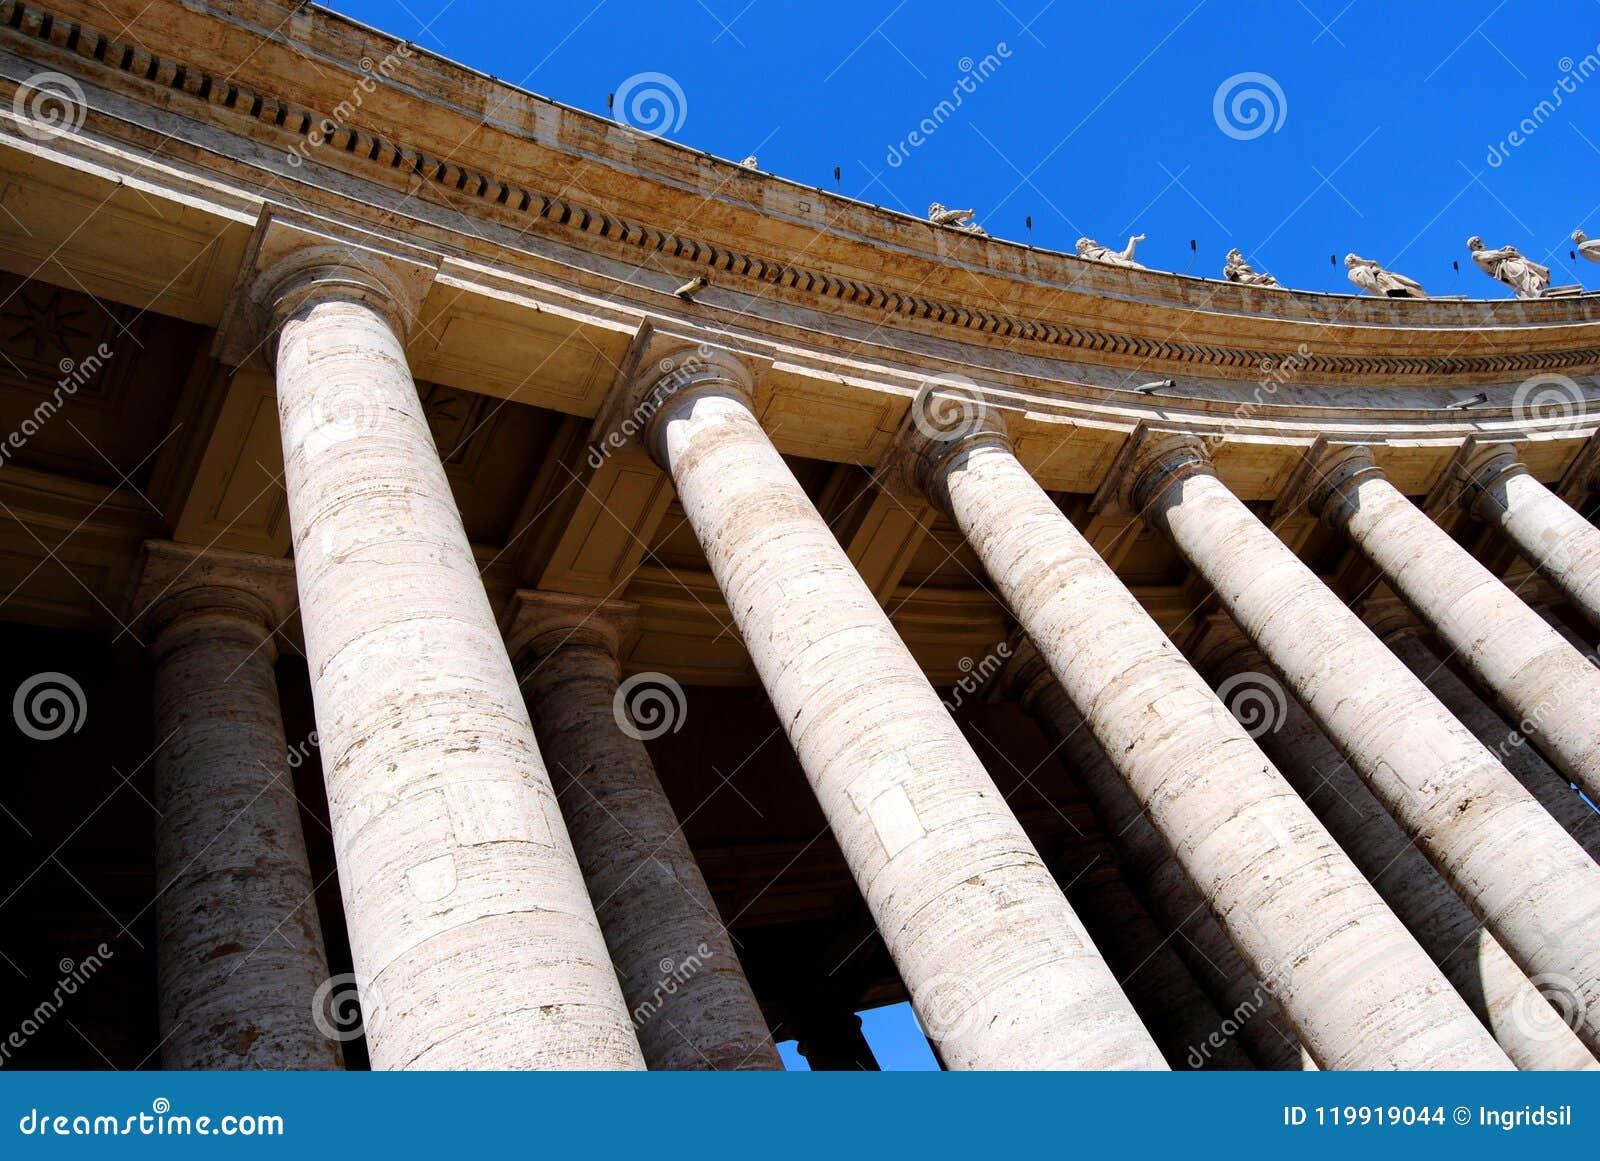 Bernini kolumnada w St Peter kwadracie, watykan